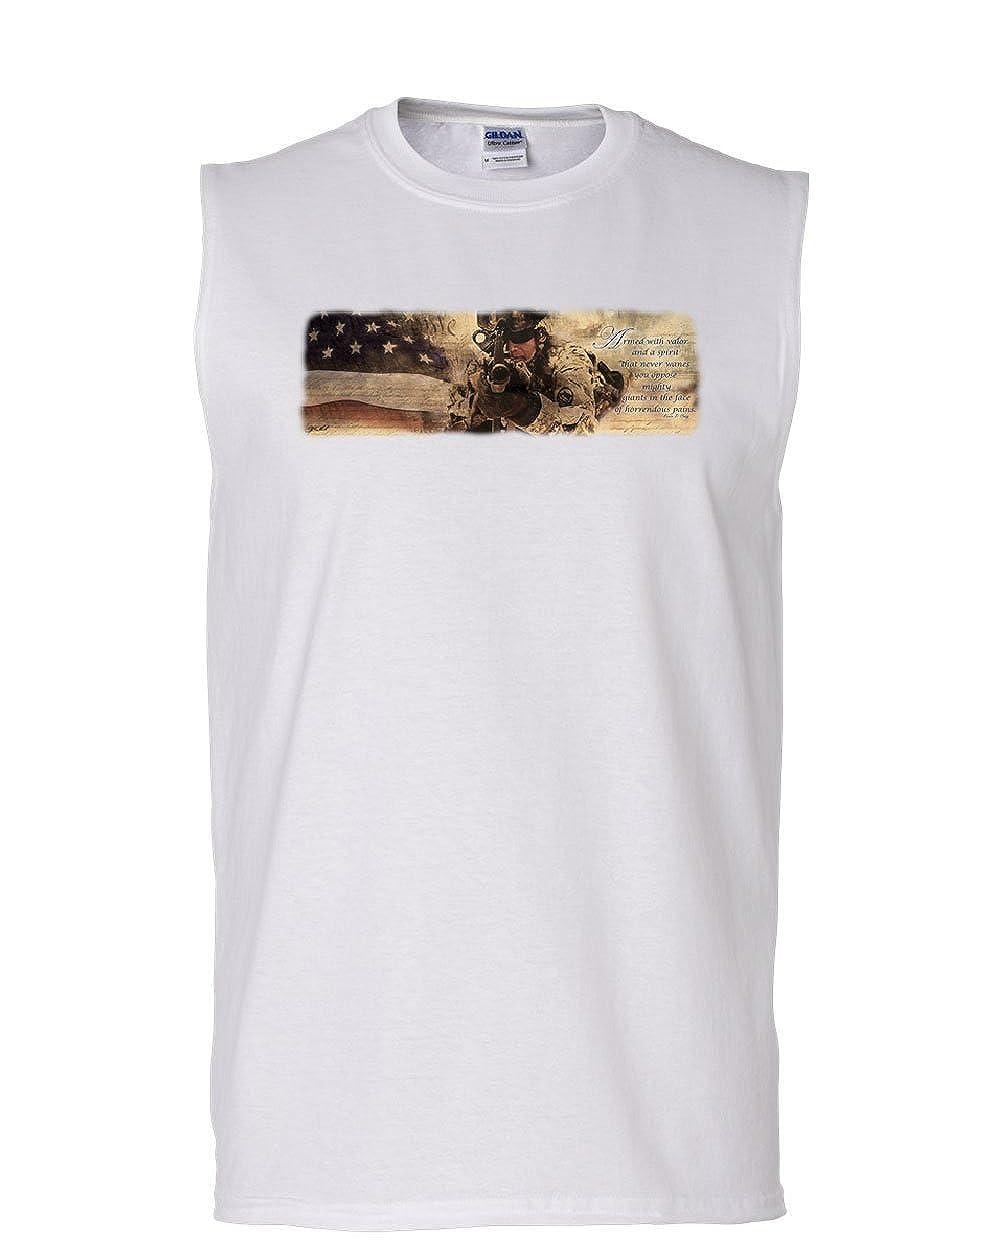 Tee Hunt Armed with Valor Muscle Shirt USA Patriotic Veteran POW MIA Sleeveless